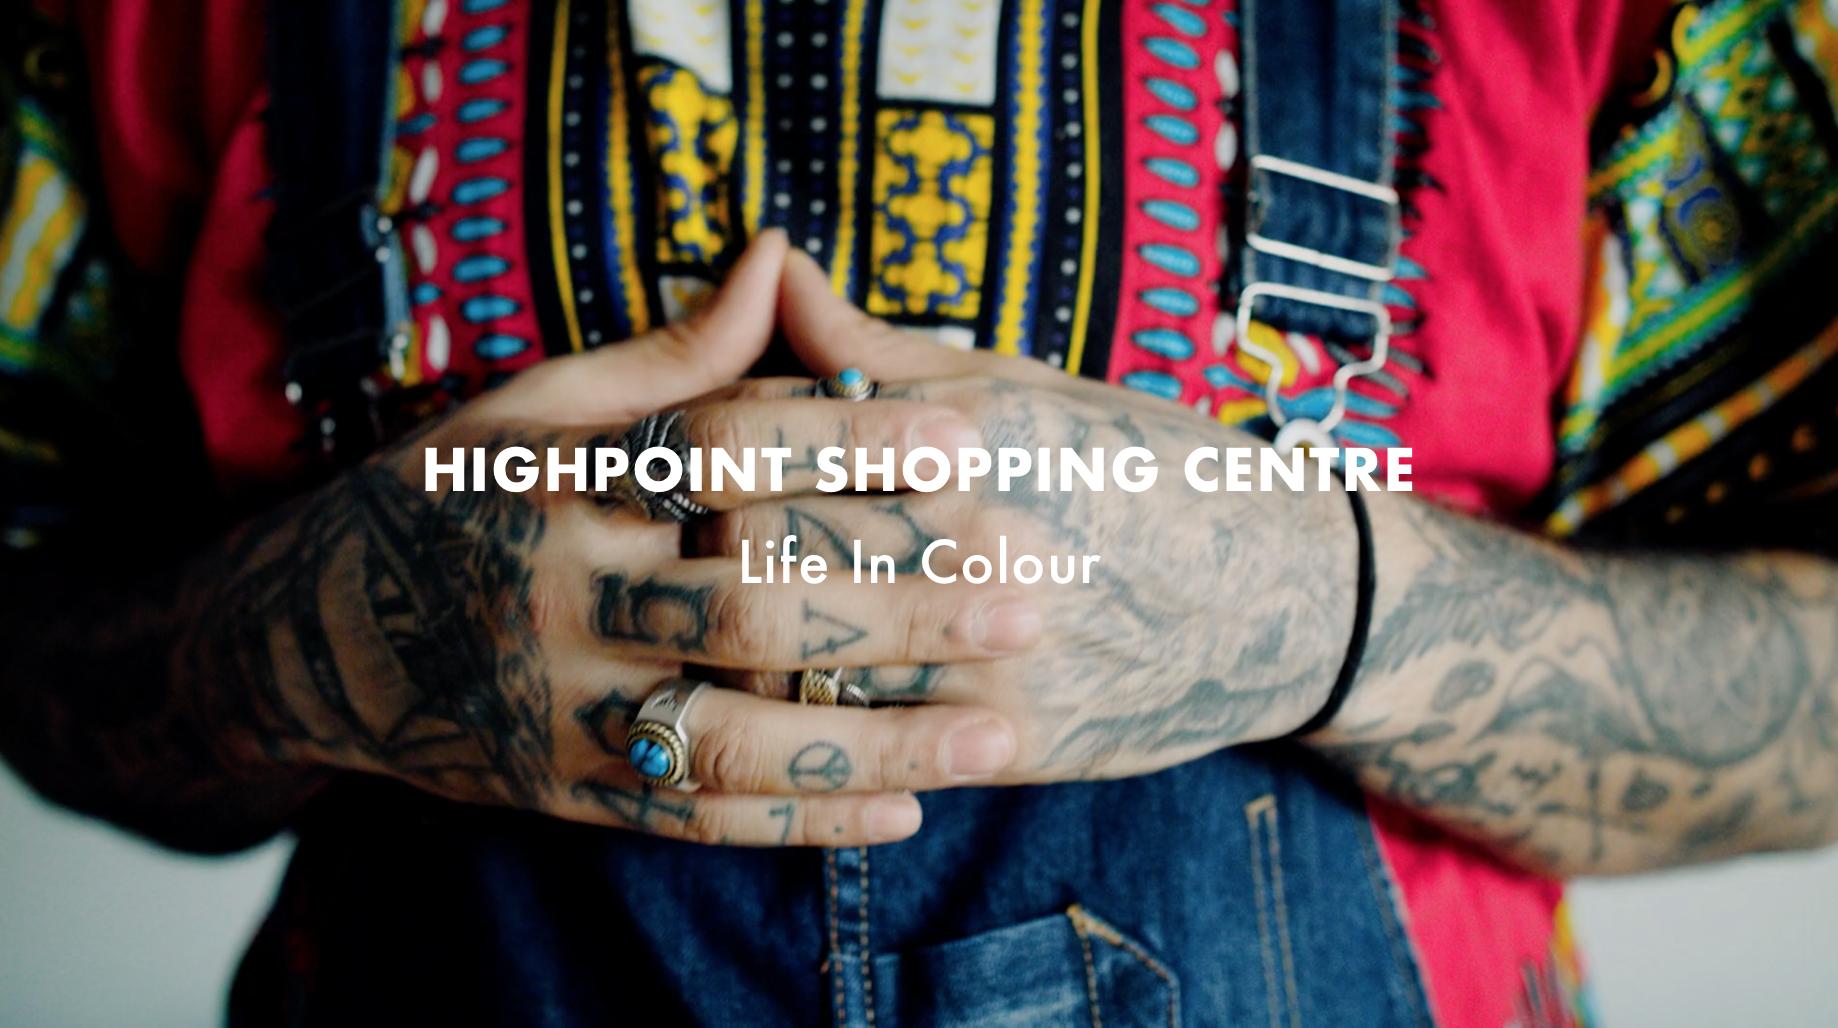 Highpoint Shopping Centre - Life In Colour